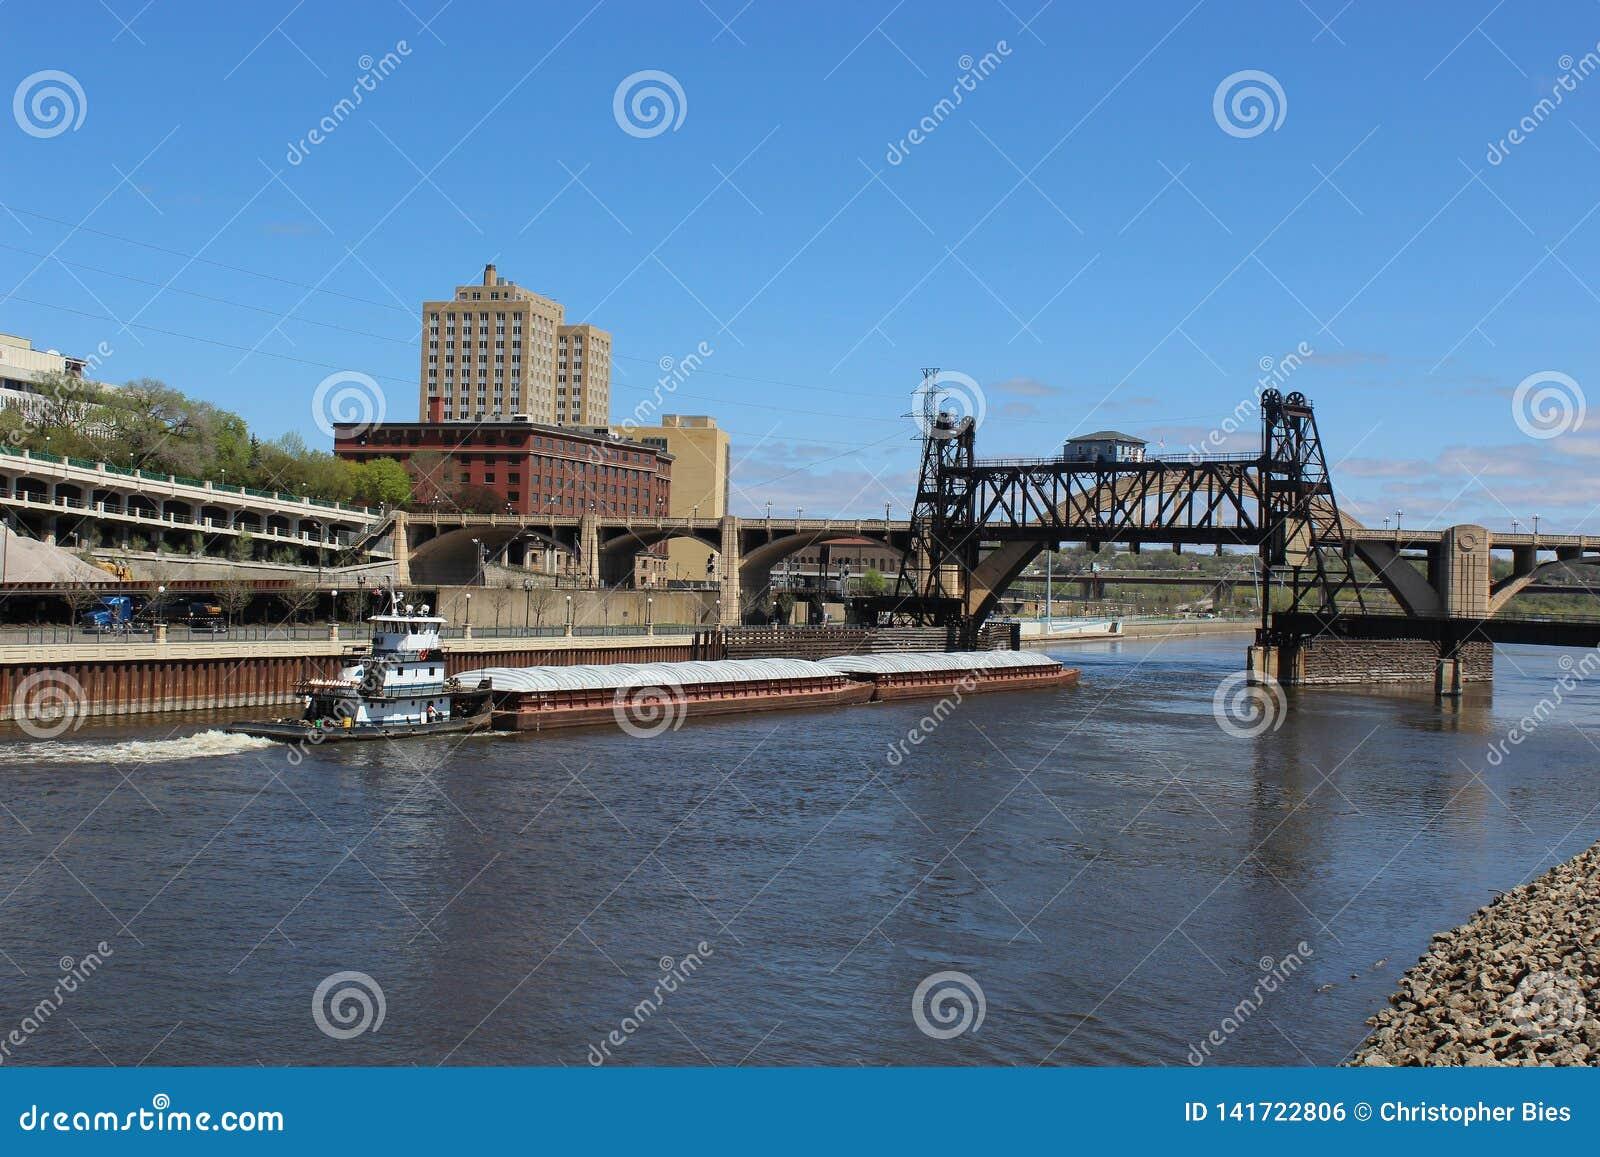 Barge On River Passing Under Lift Bridge Stock Photo - Image